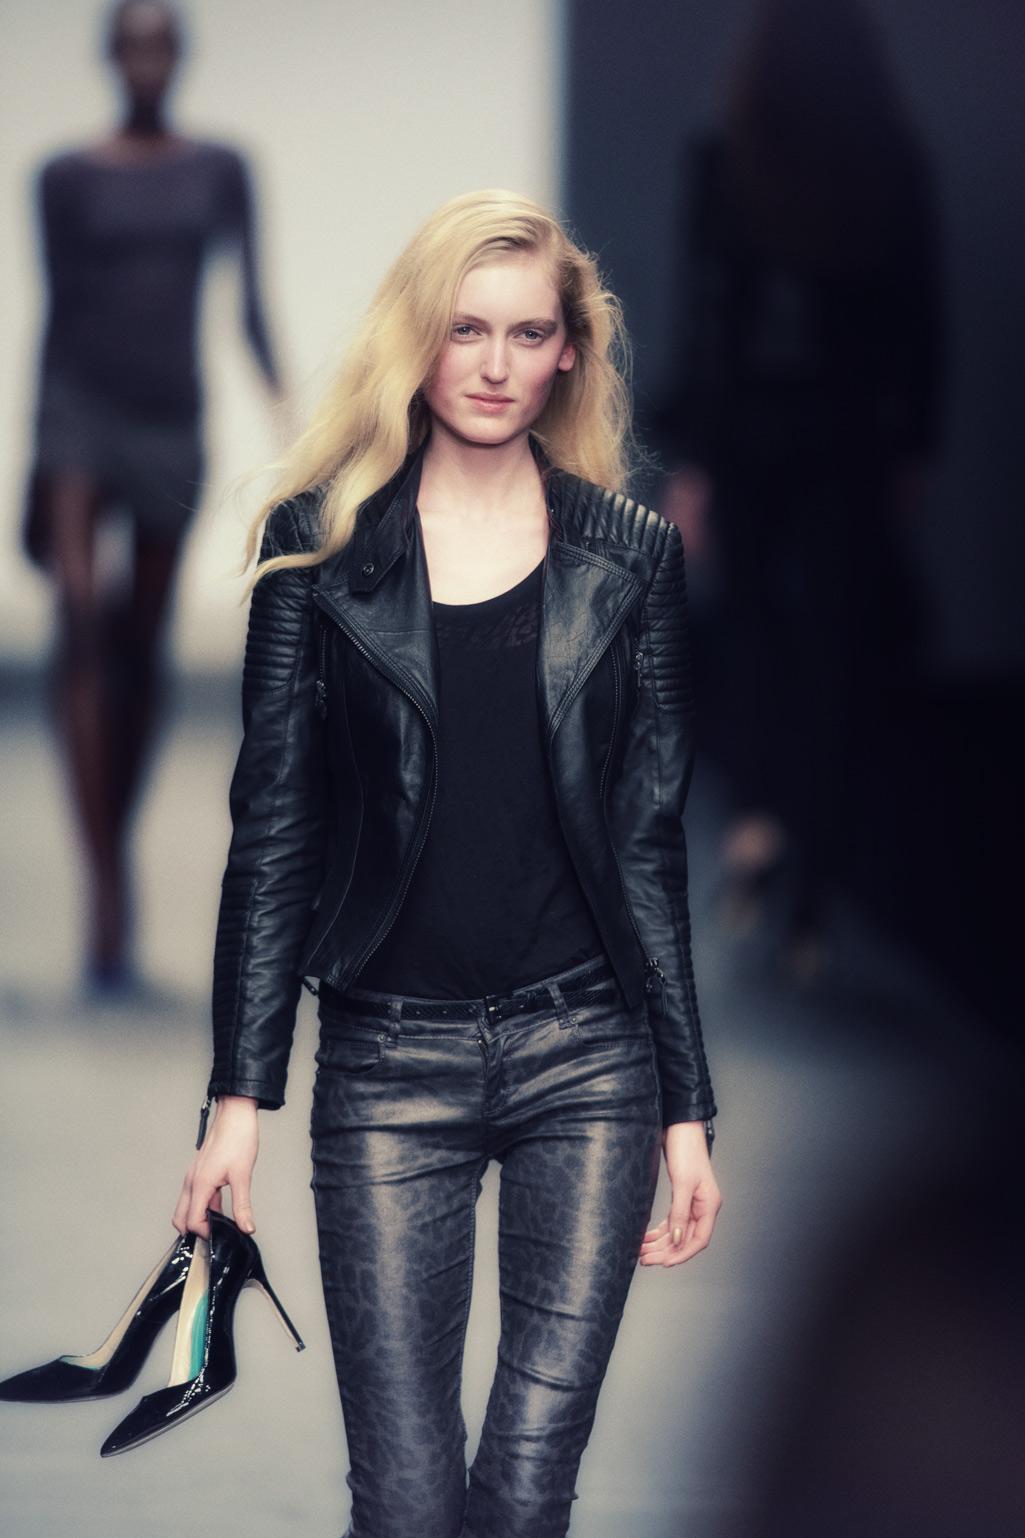 london-fashionweek-1546